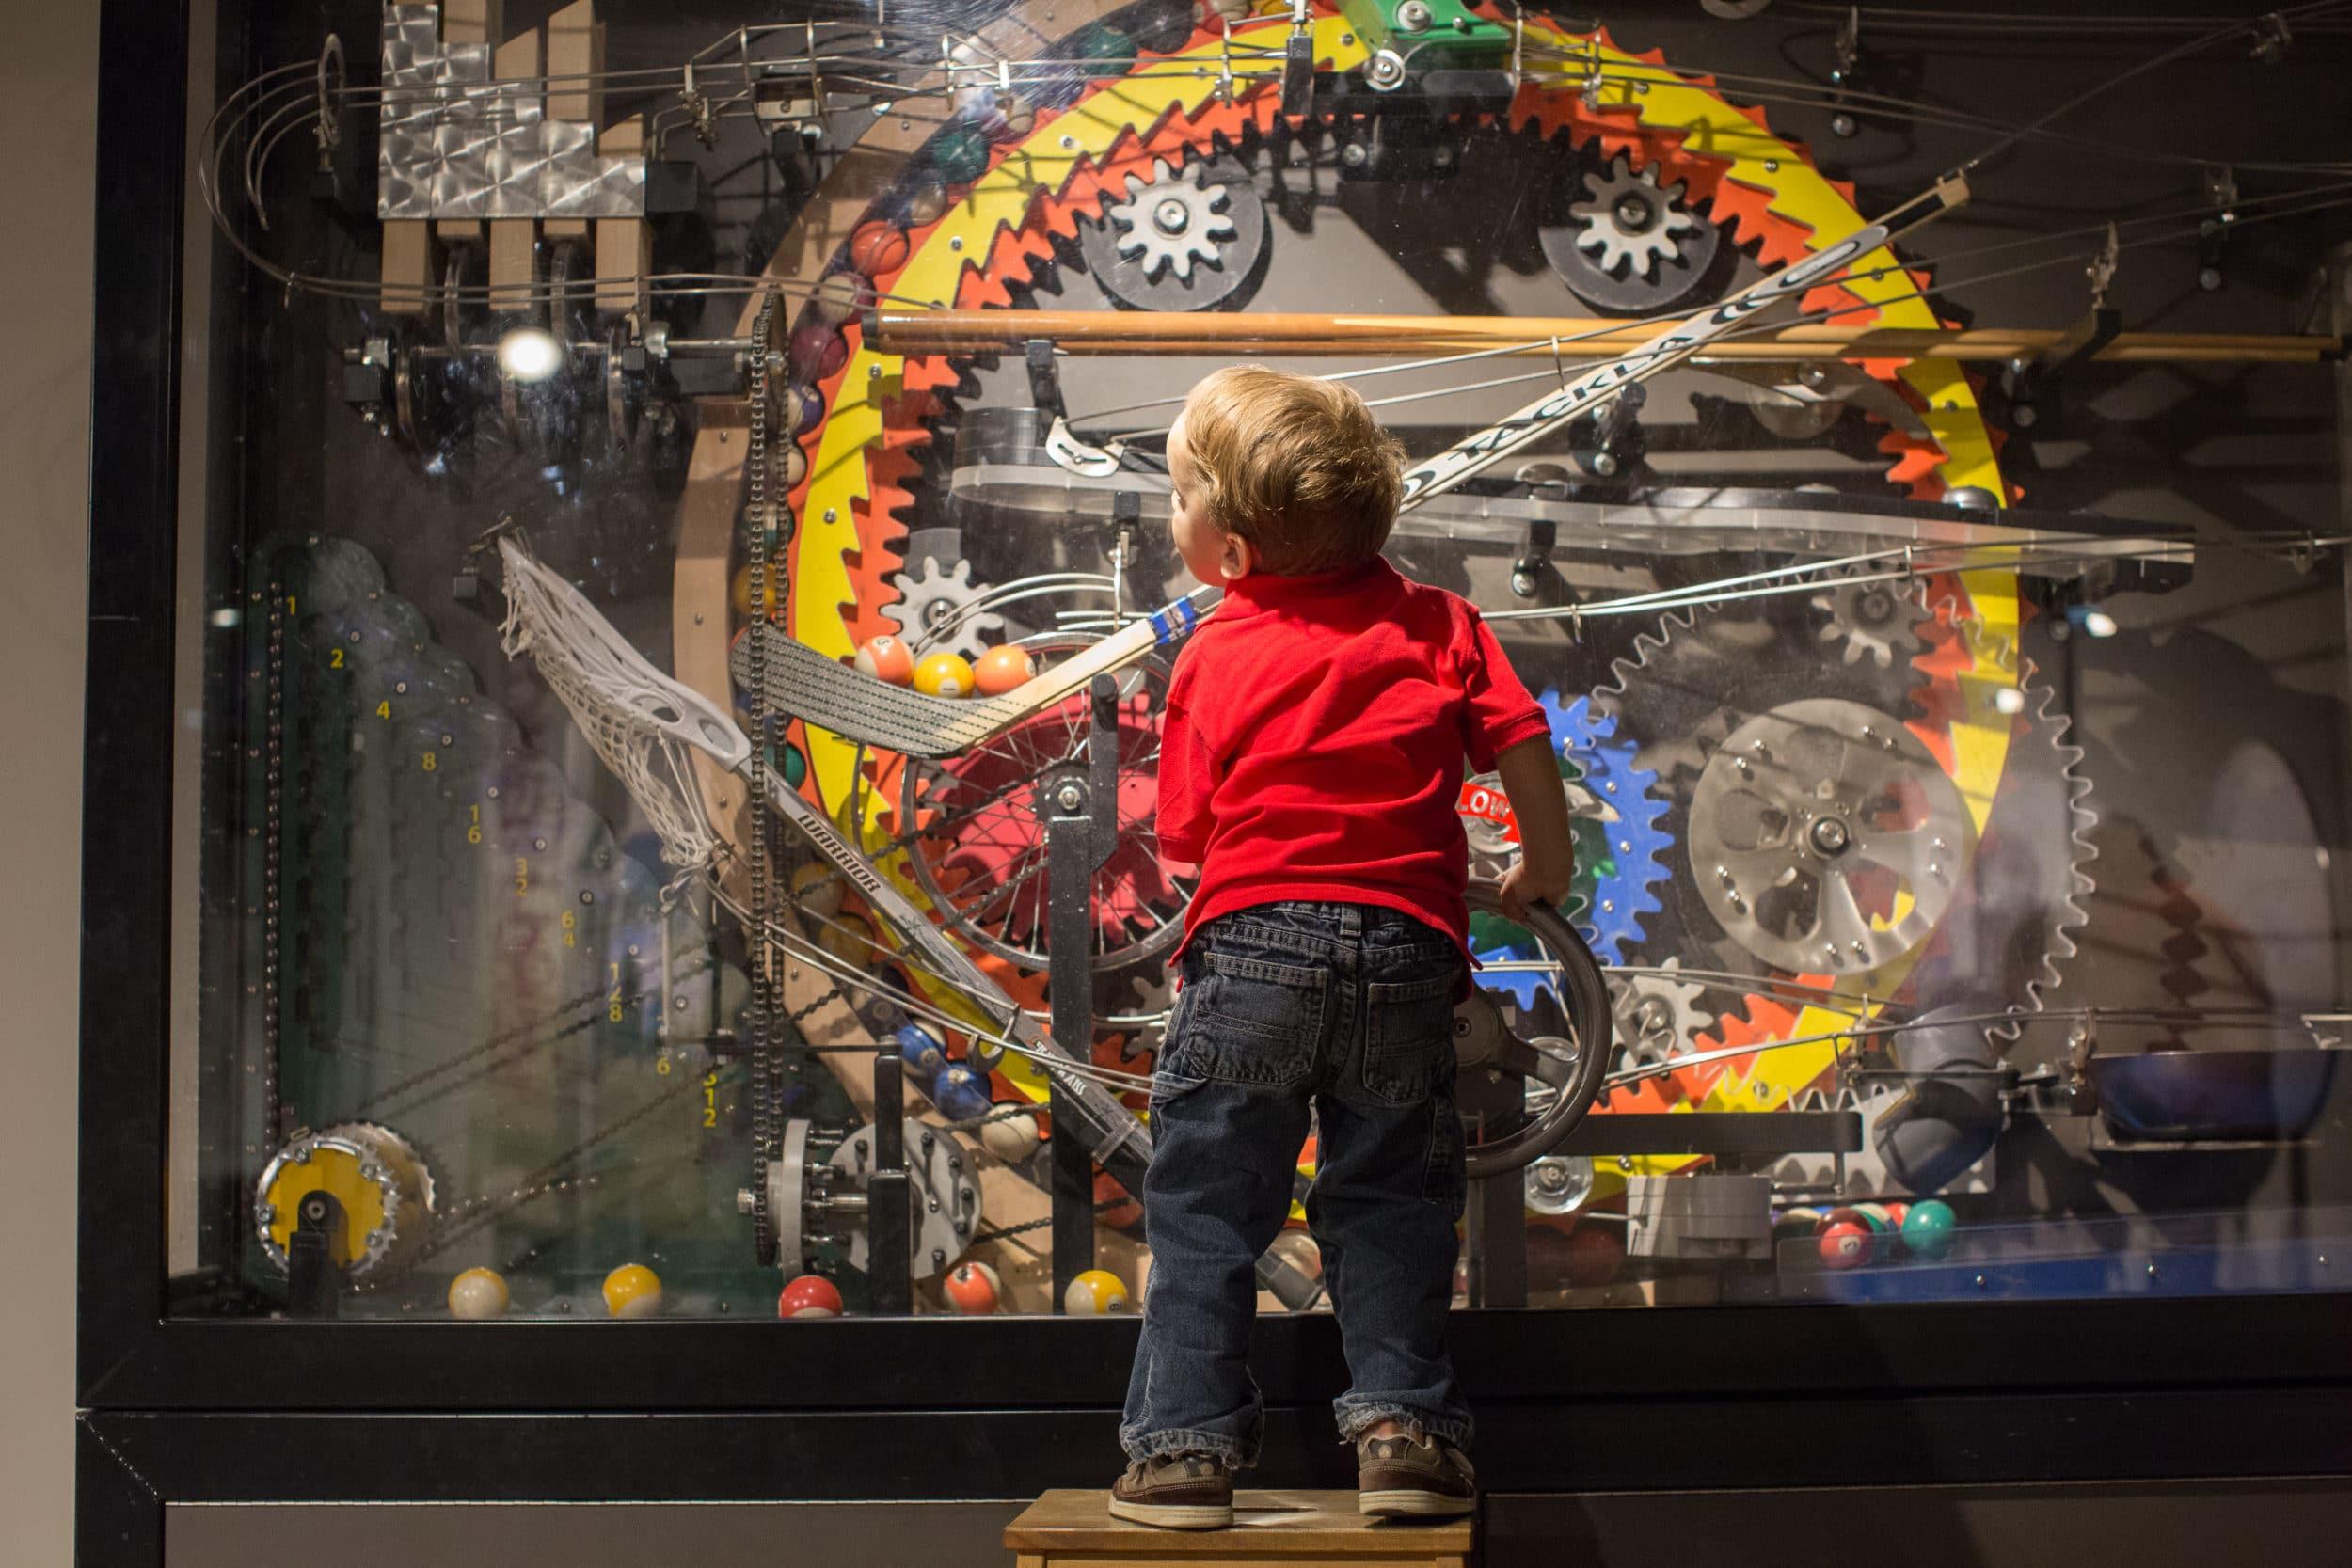 Best San Diego museums: Fleet Science Center